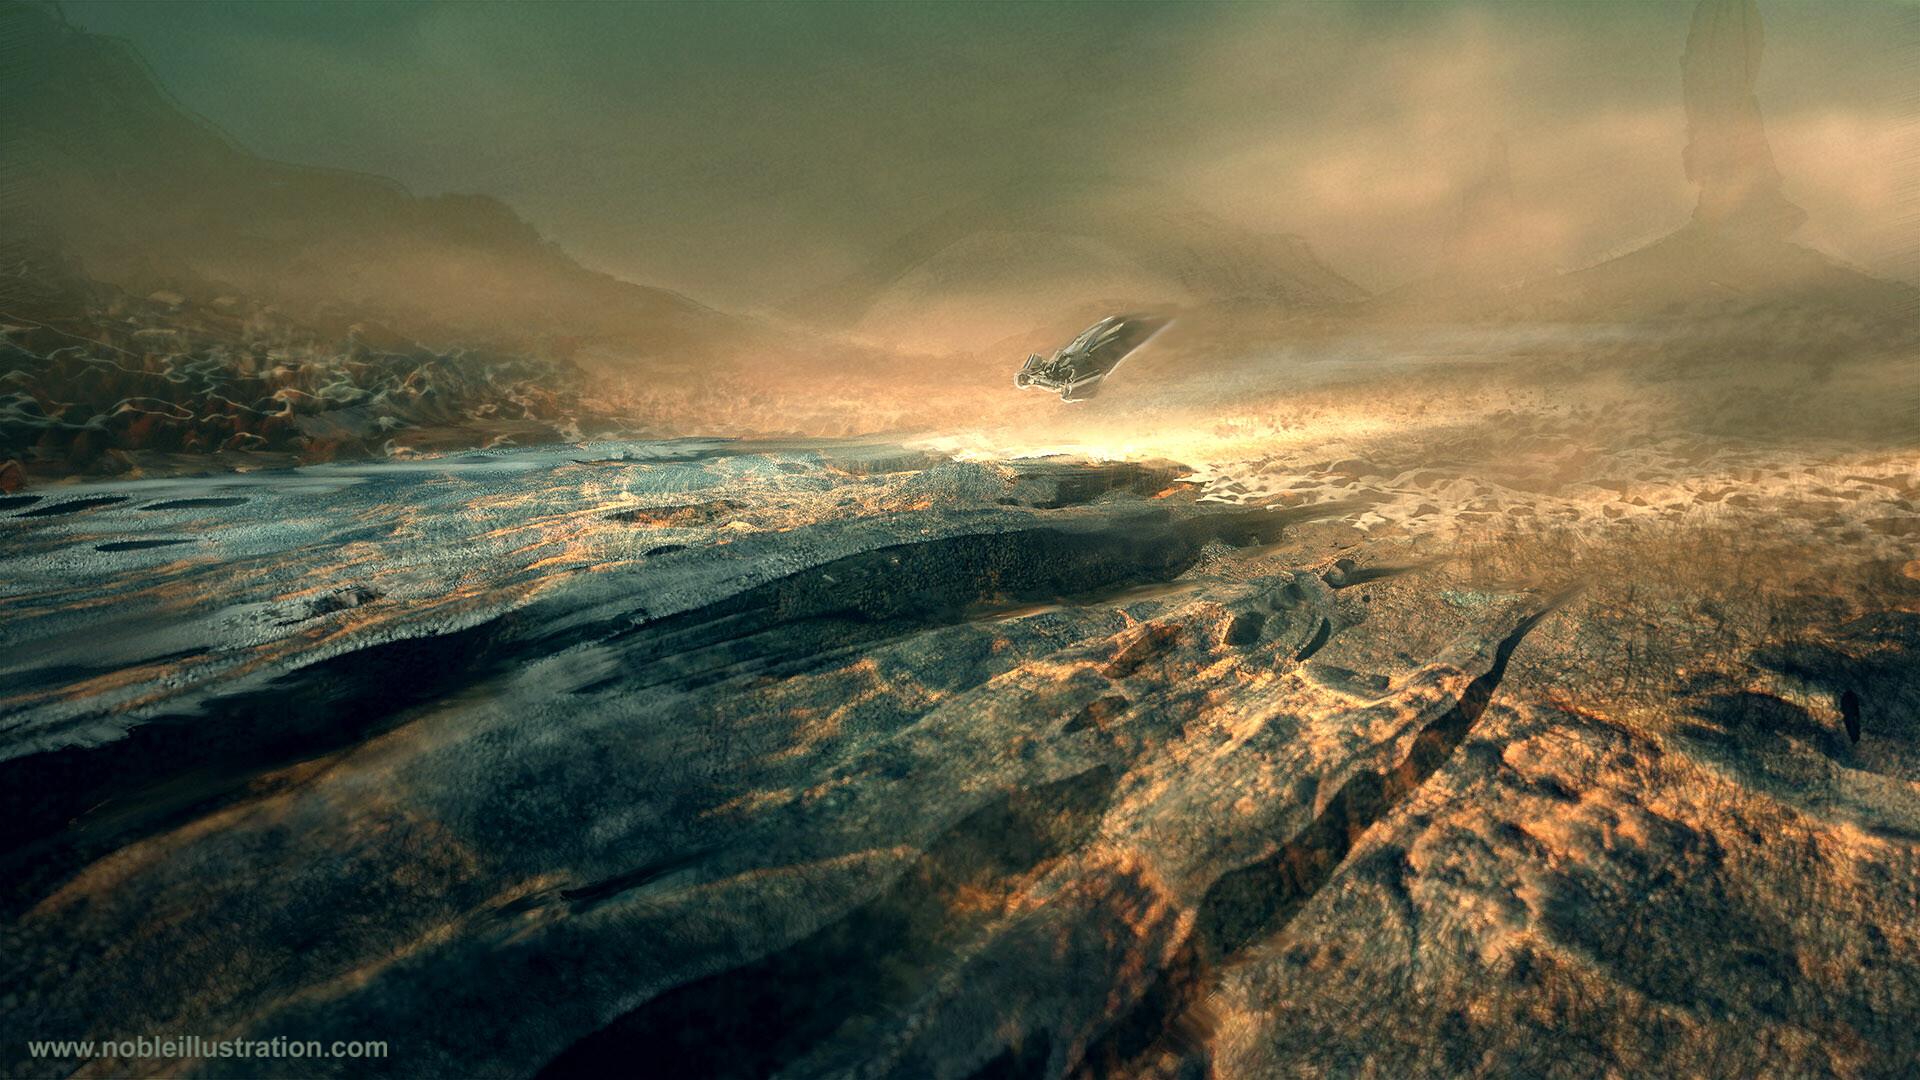 Barren landscape with Ship